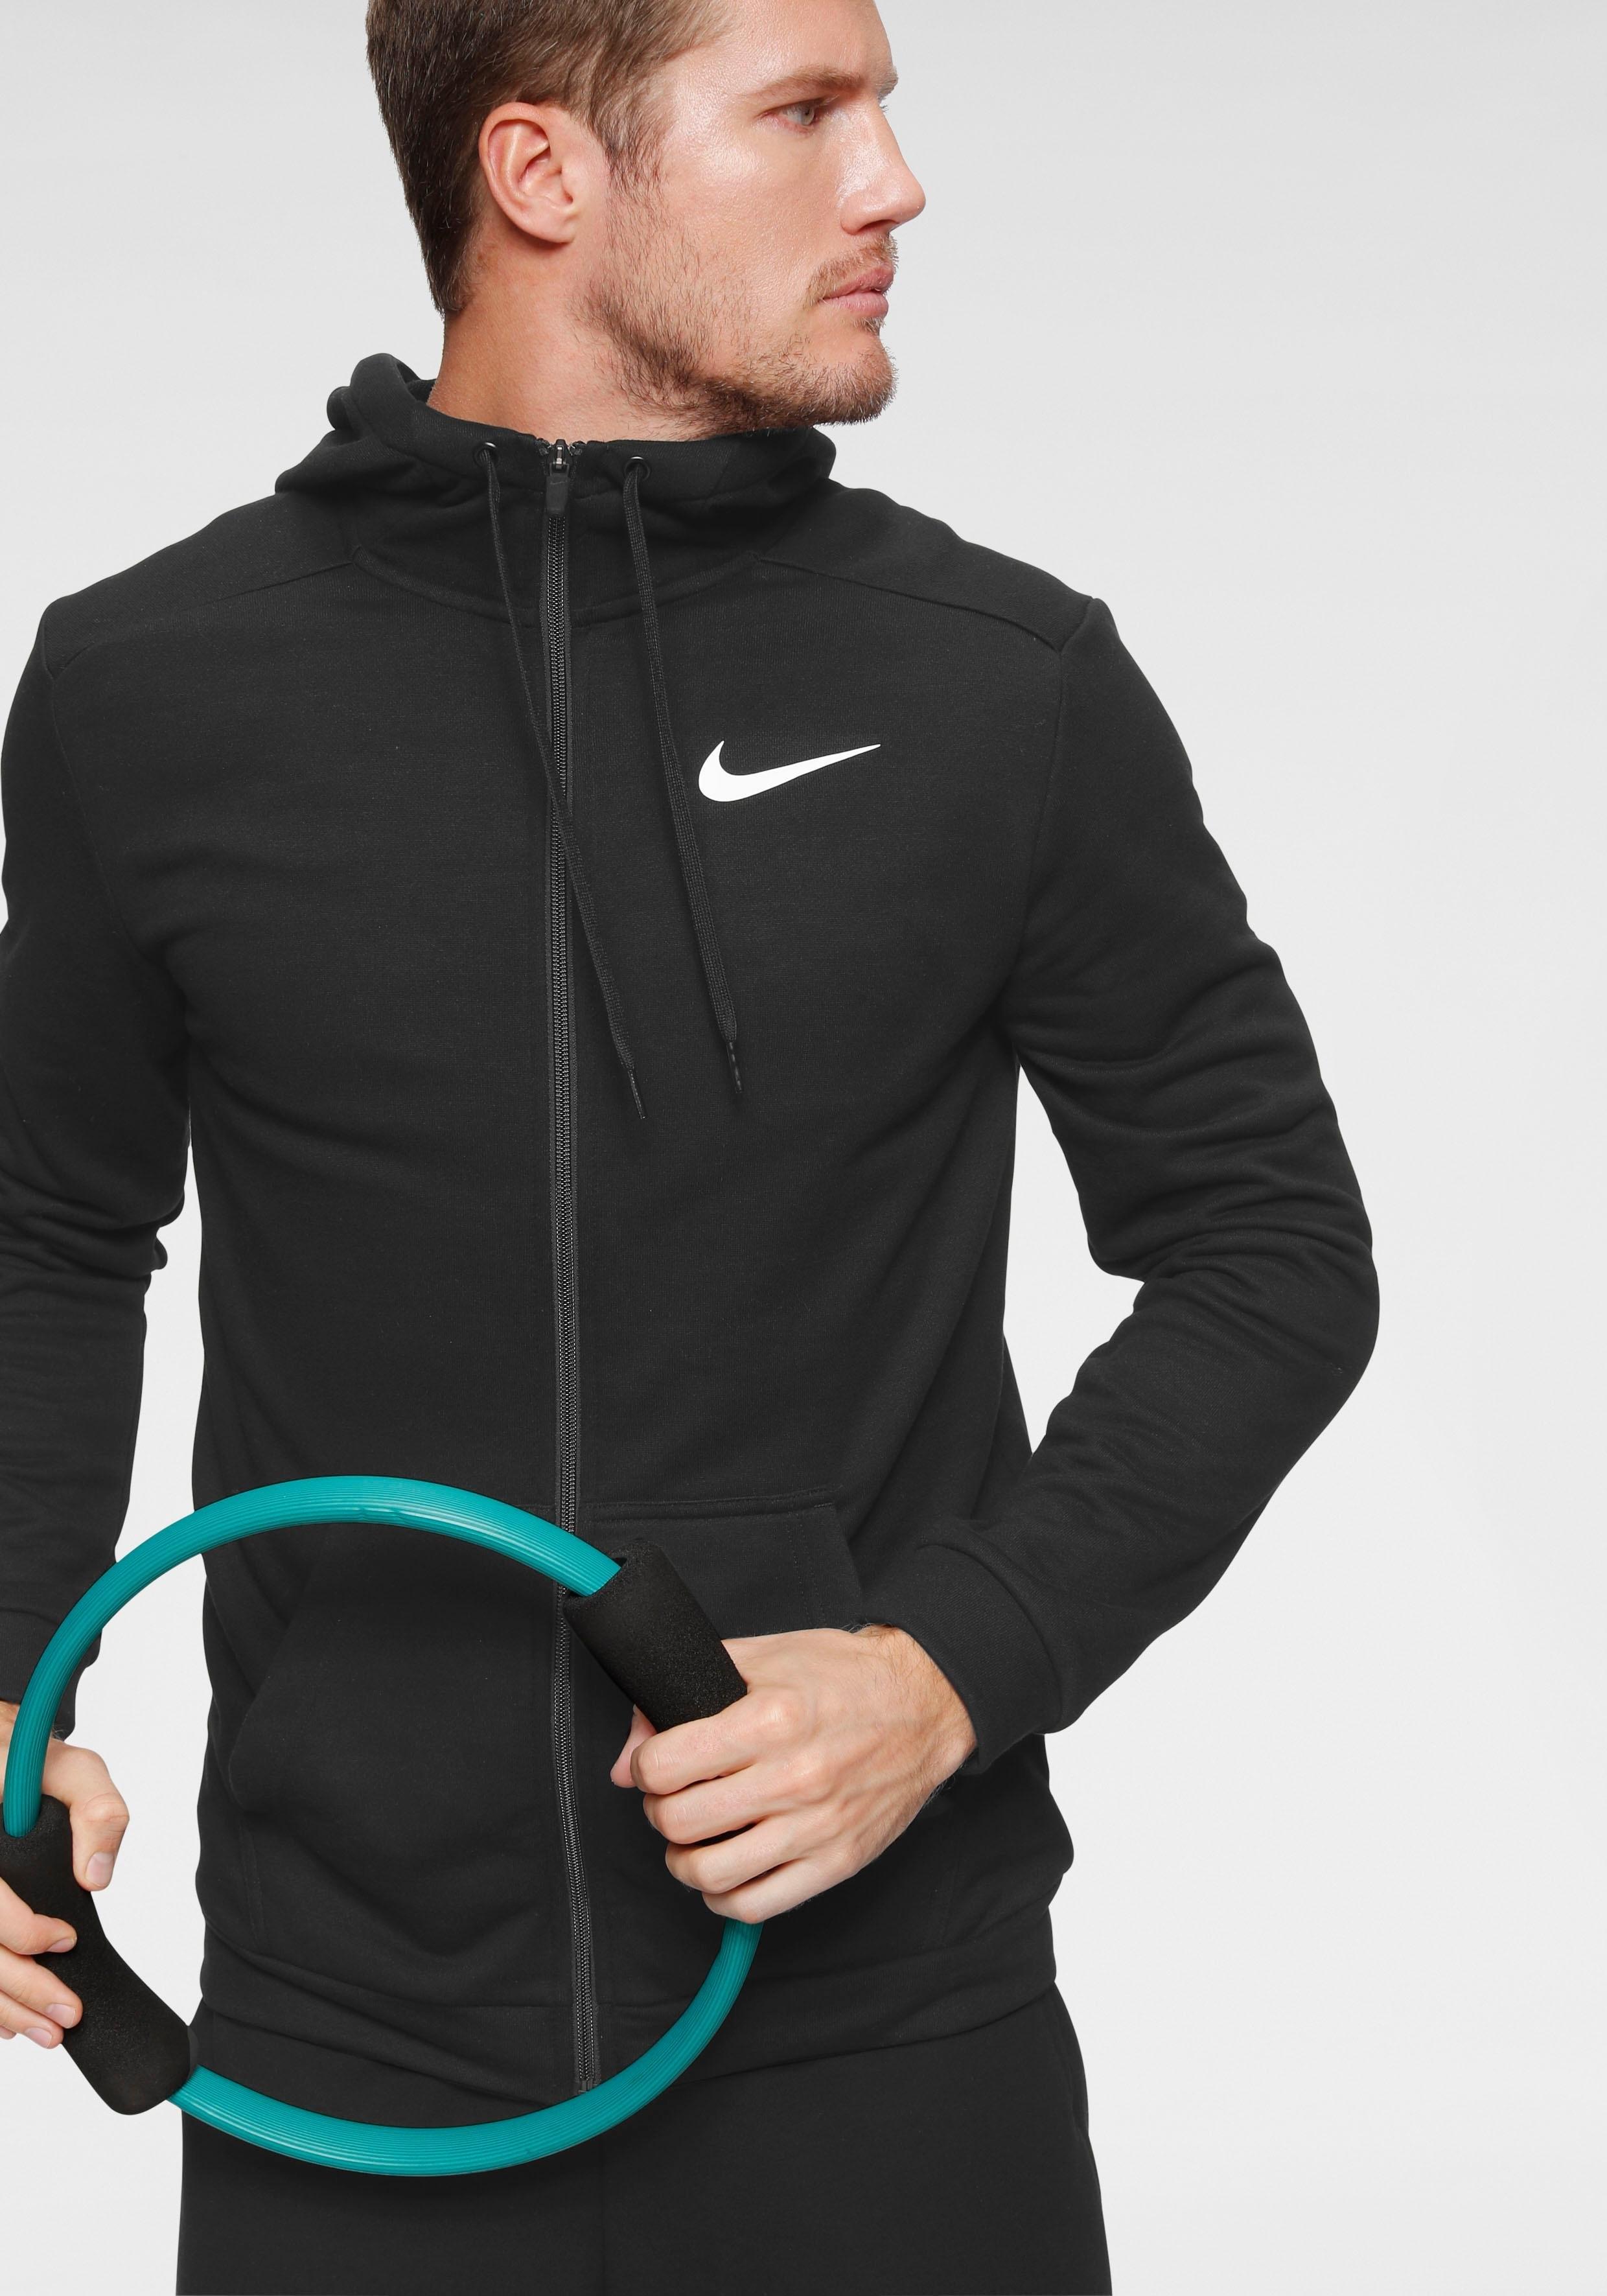 Nike capuchonsweatvest »Nike Dri-FIT Men's Full-Zip Training Hoodie« bij OTTO online kopen